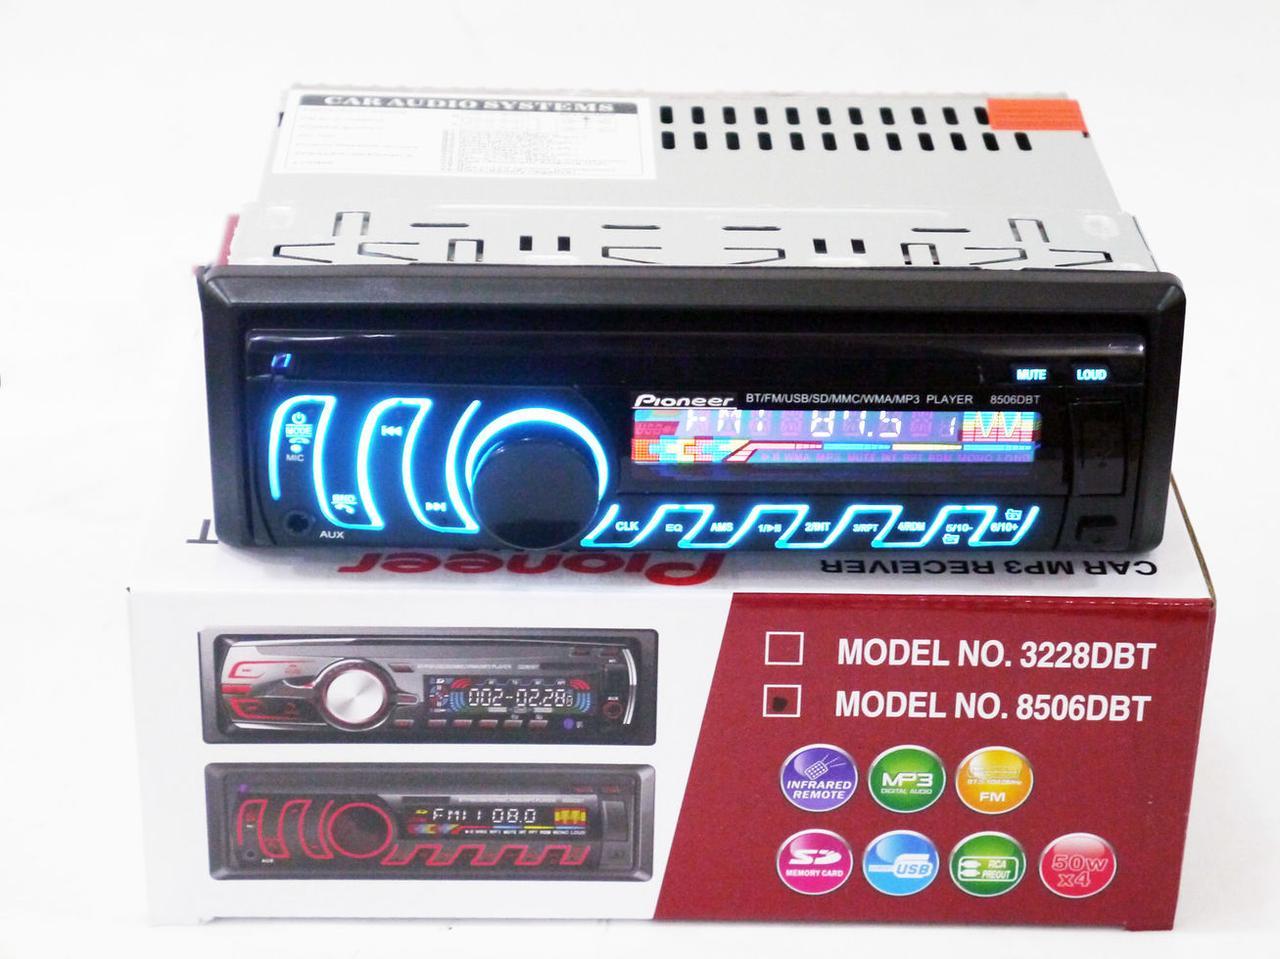 Автомагнитола Pioneer 8506 DBT (Bluetooth) RGB подсветка, съемная панель